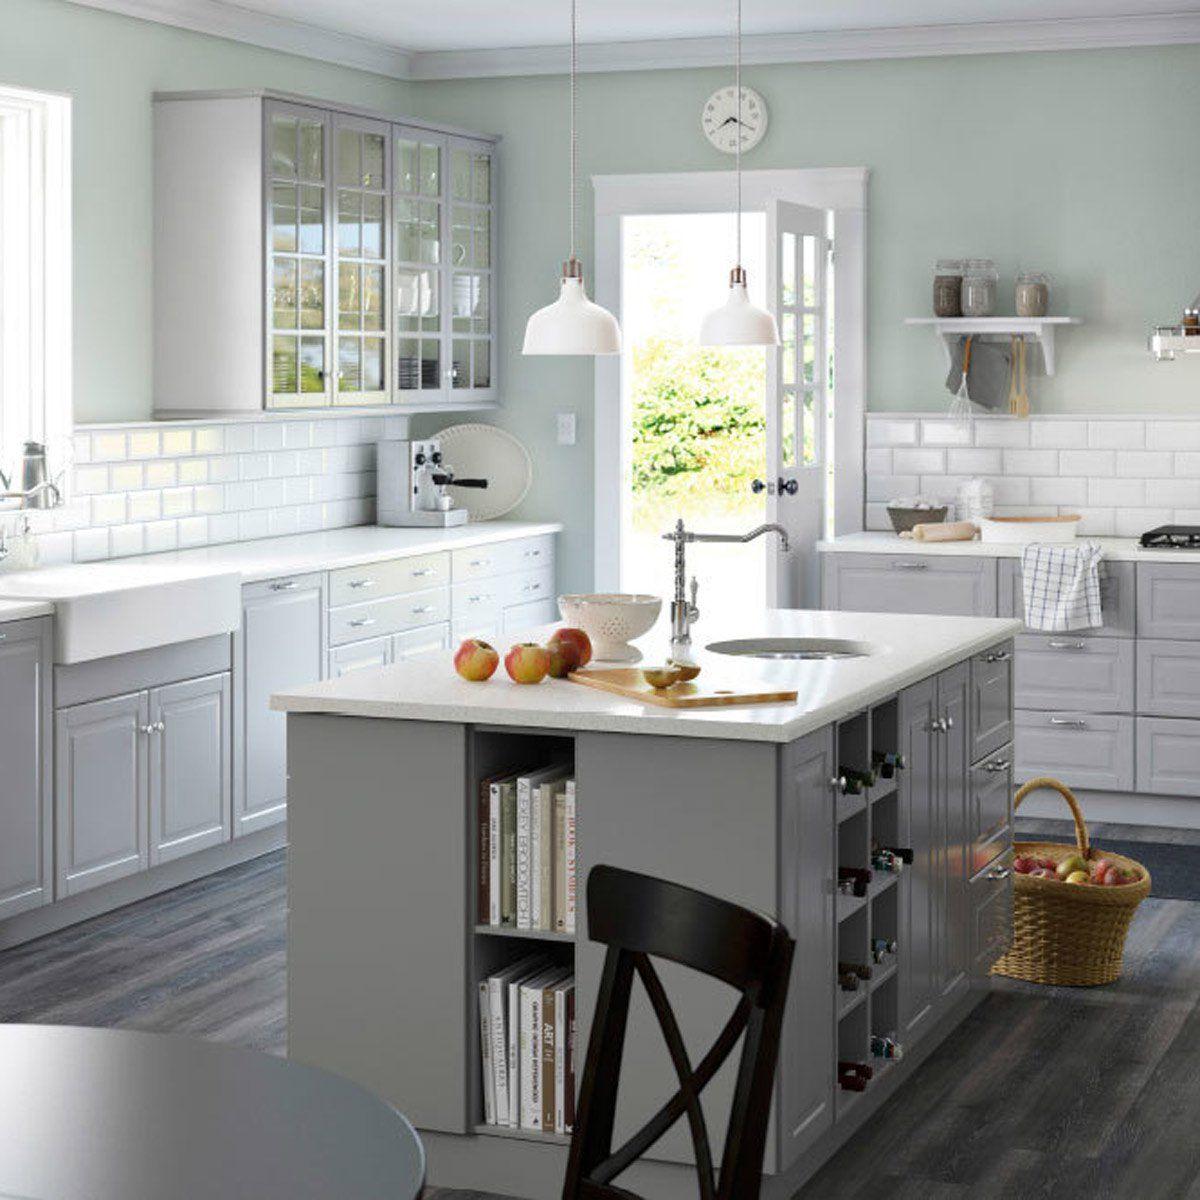 14 Tips For Better Kitchen Lighting New Kitchen Cabinets Ikea Kitchen Design Kitchen Inspirations